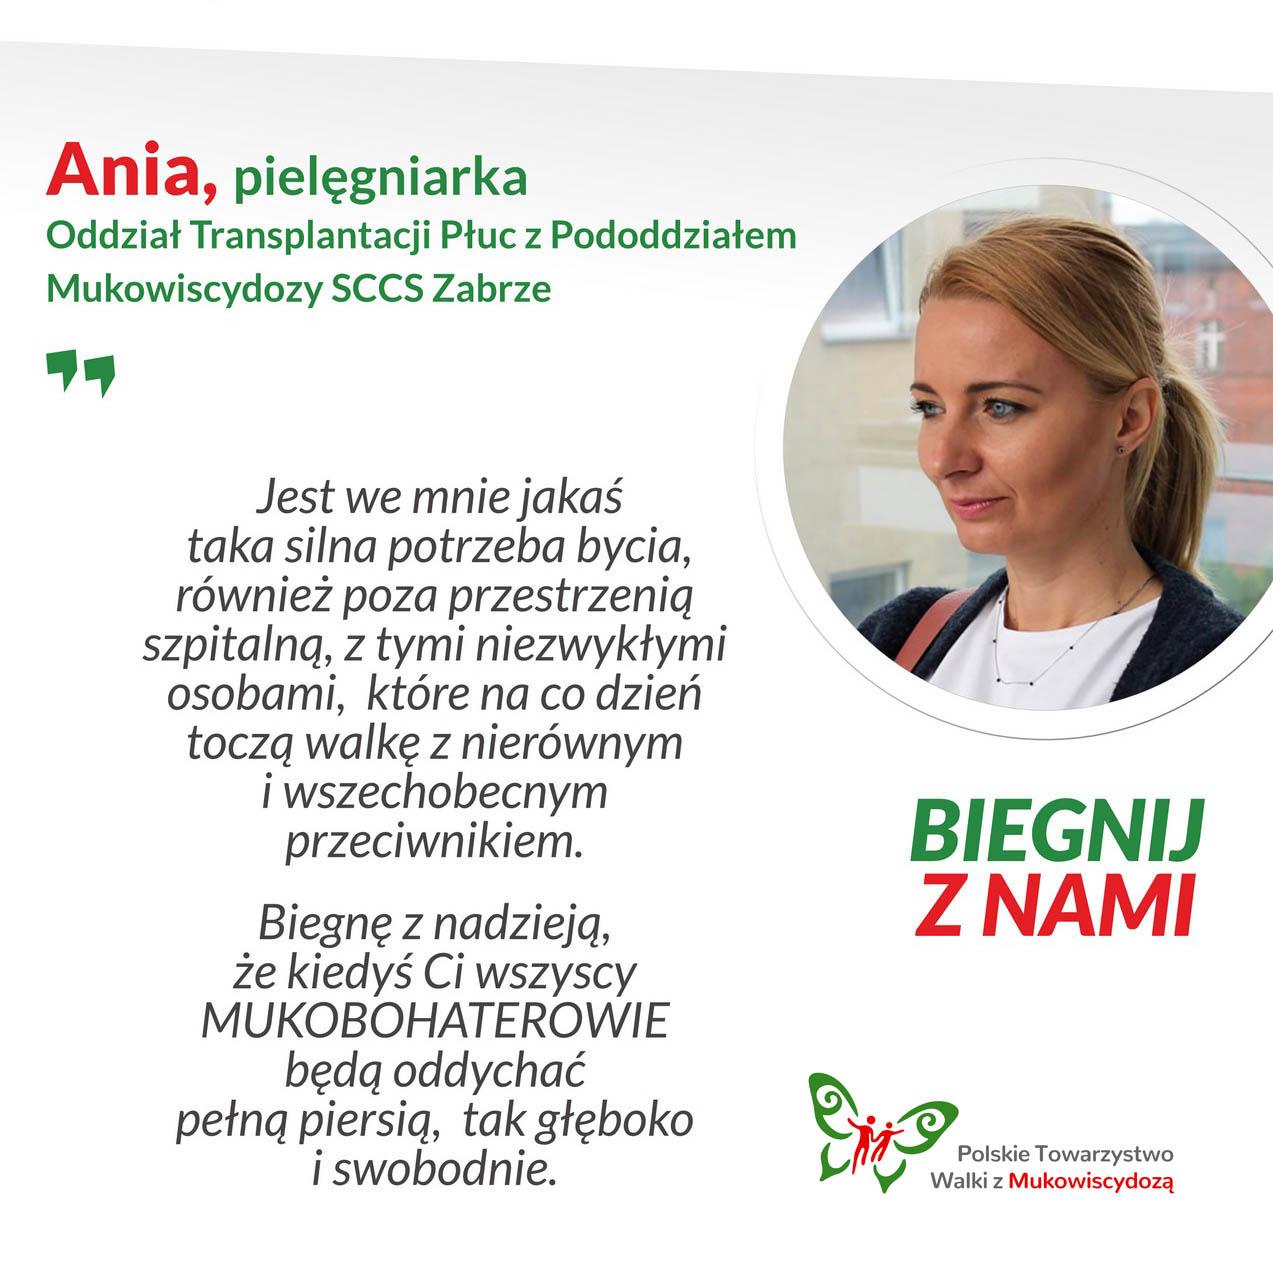 Ania, pielęgniarka